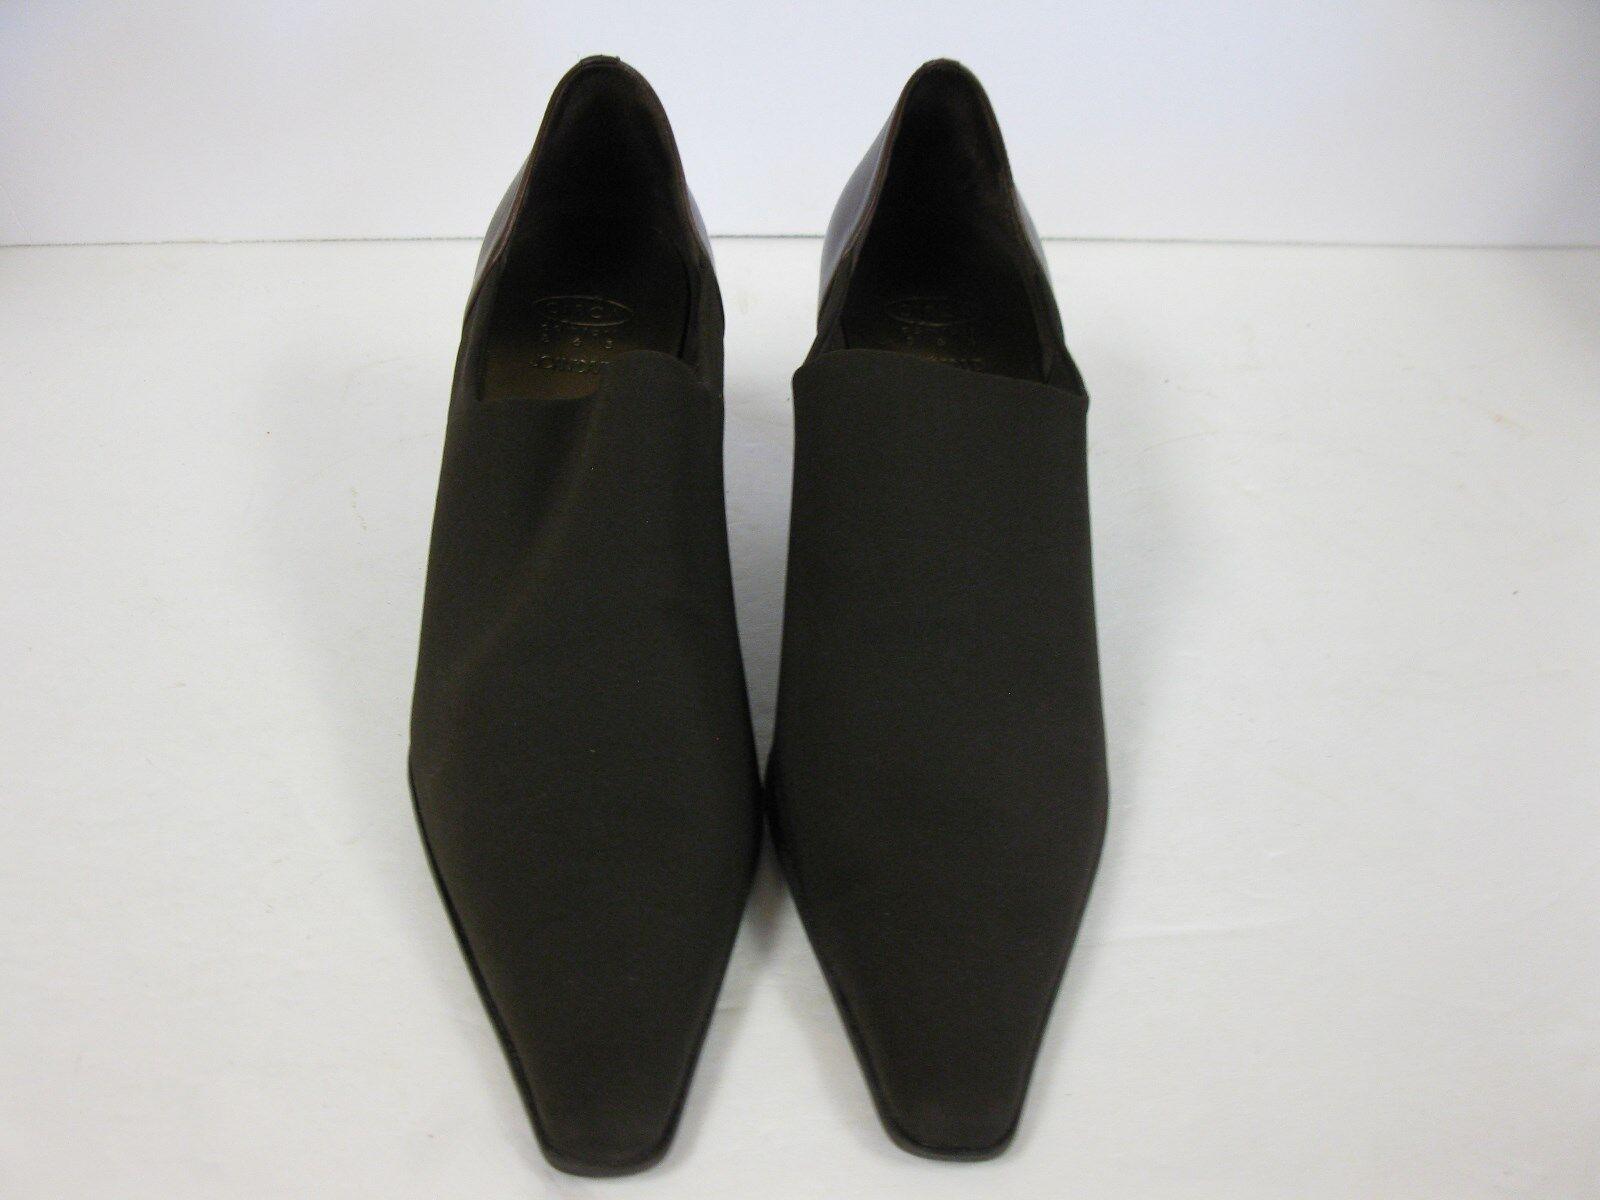 Circa Joan & David Solanda Brown Stretchy Fabric Pumps Heels Donna size 9.5